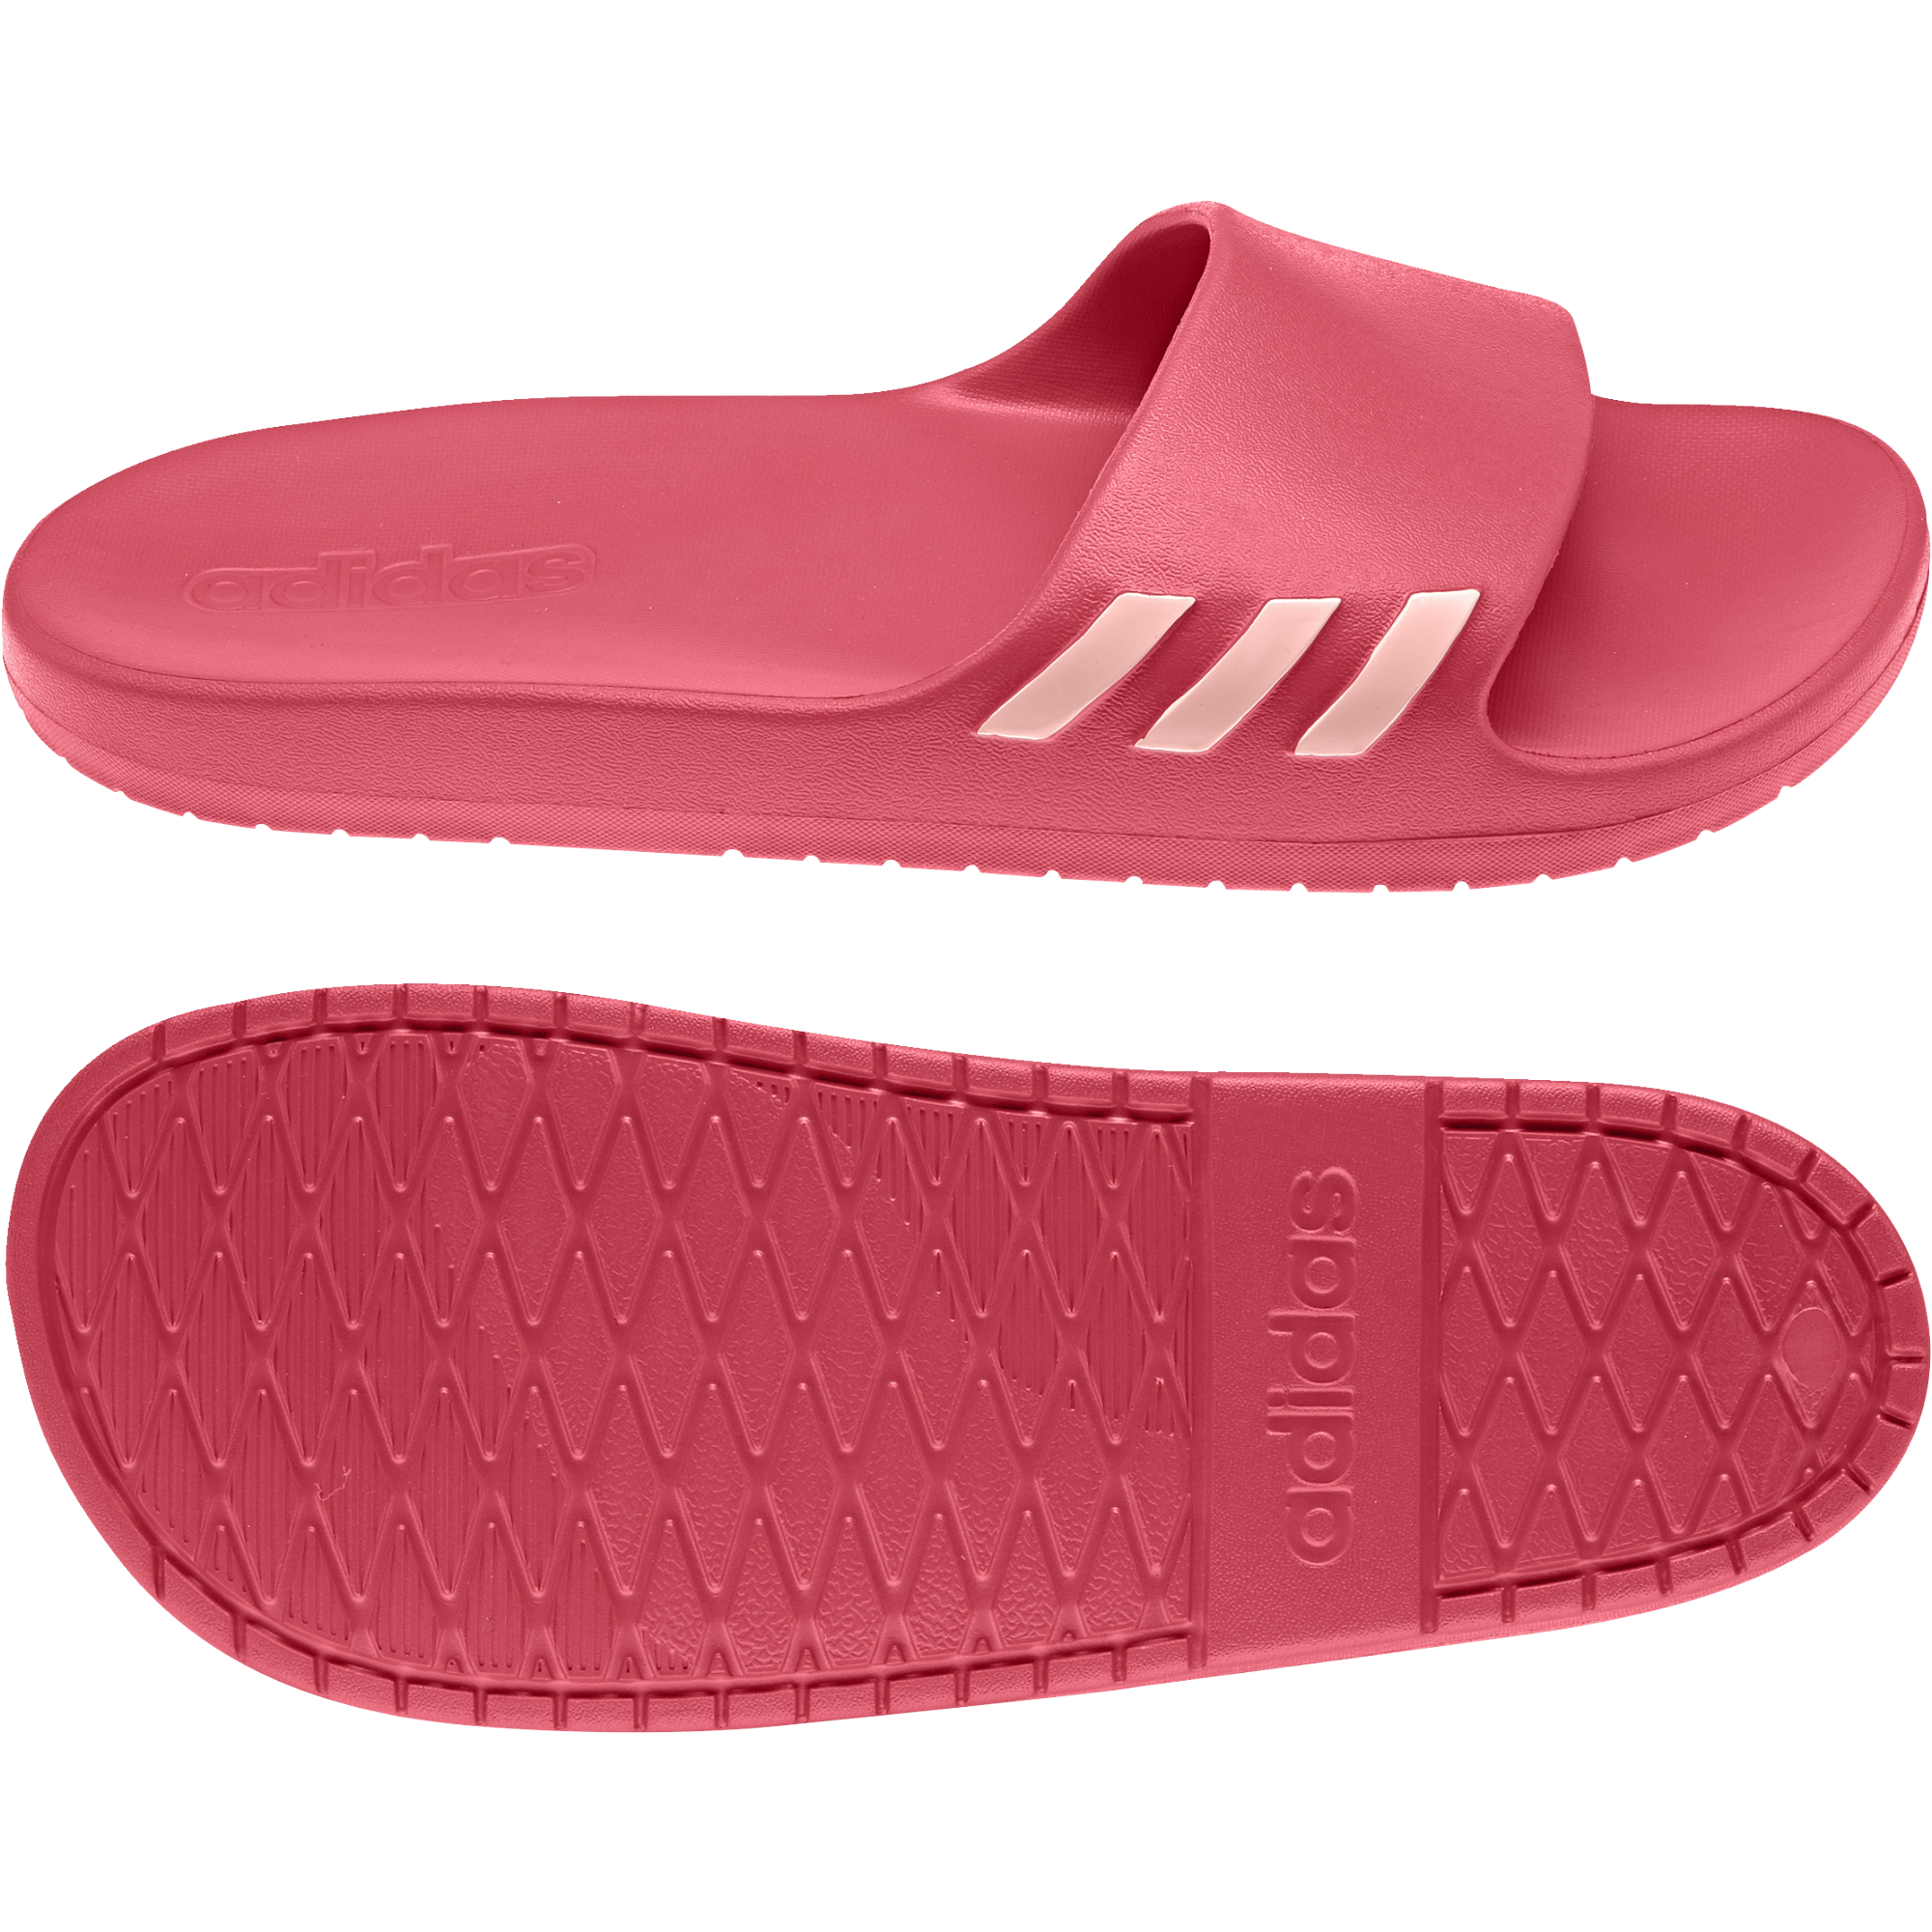 Adidas Aqualette w női papucs  c48332b66f